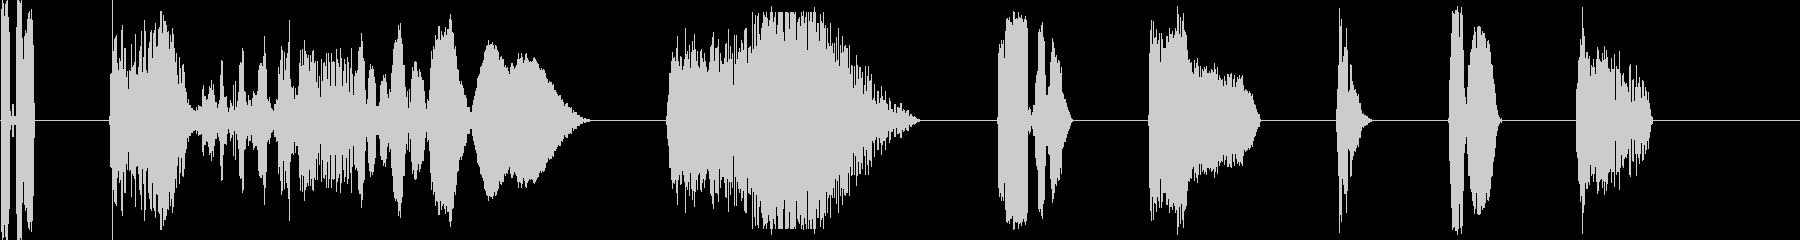 DJコンピューター画面出力X8の未再生の波形